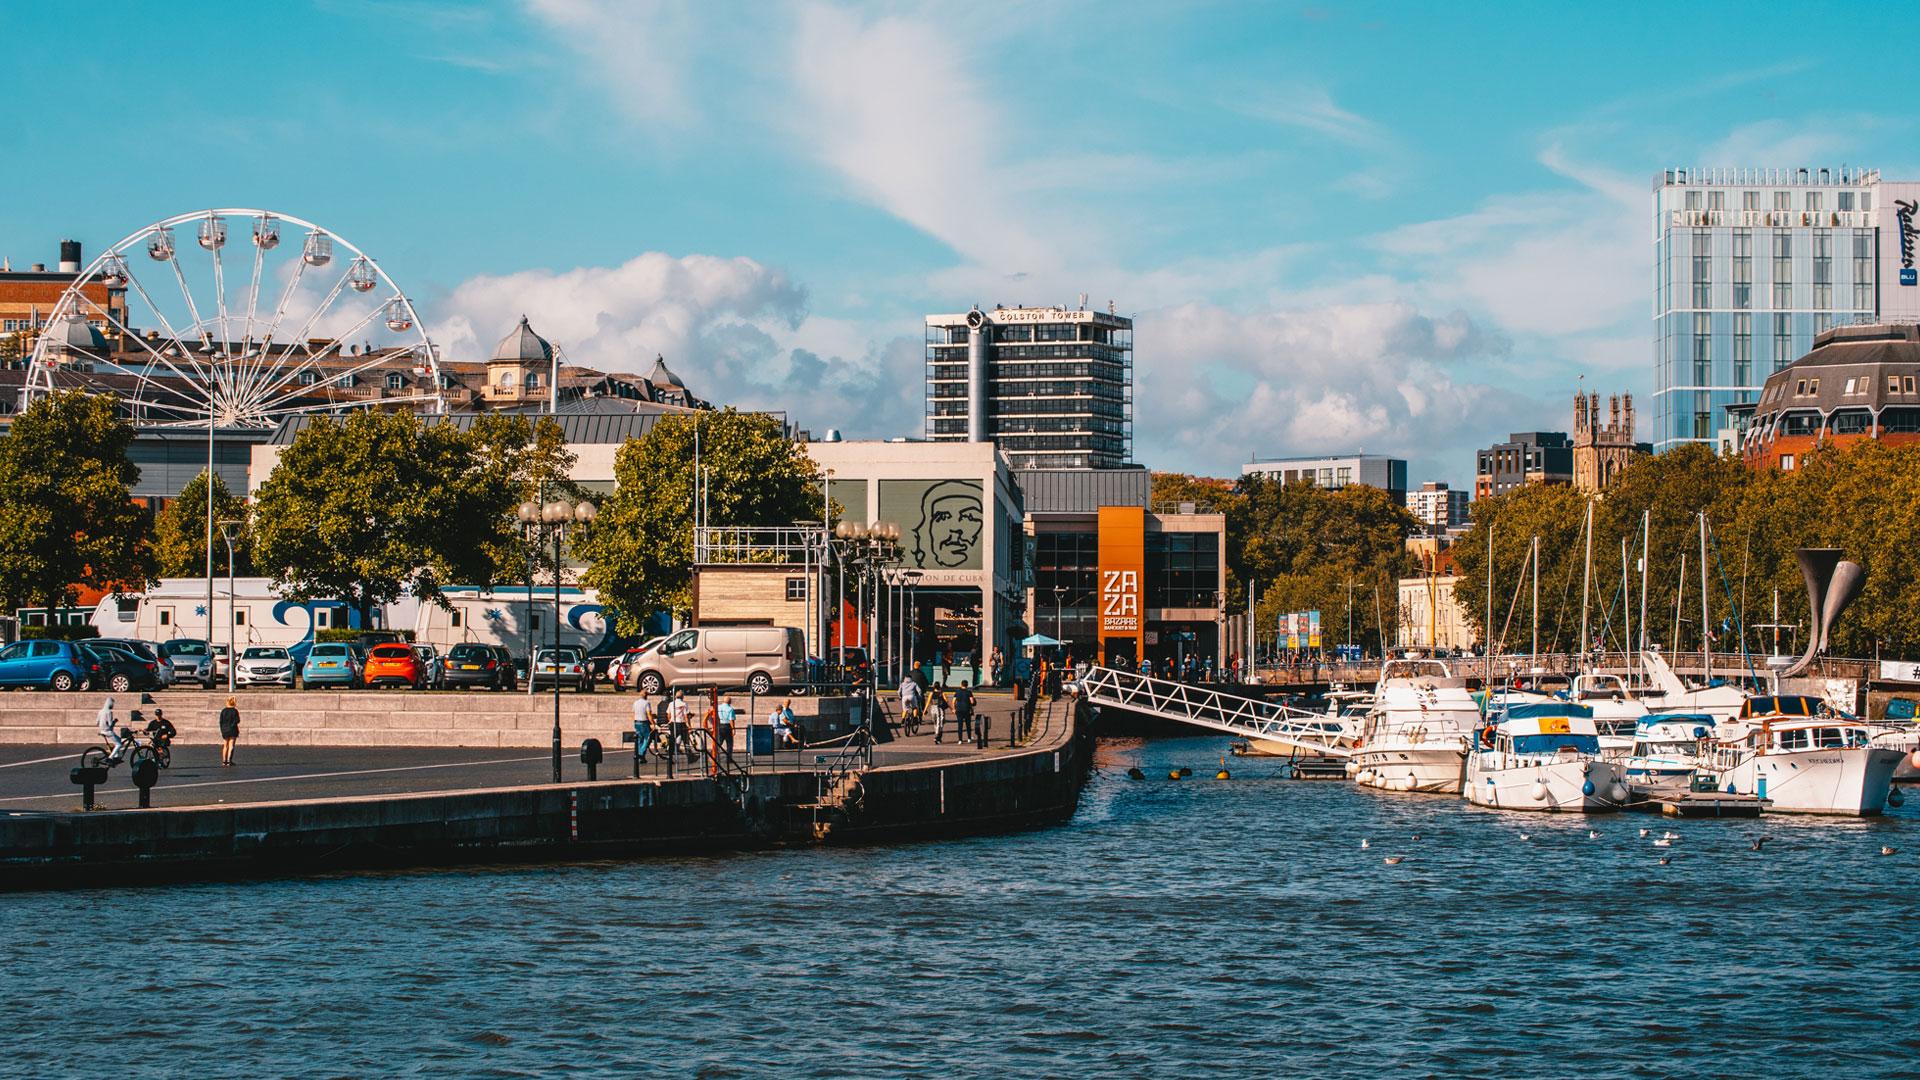 Bristol Harbour on the Avon river